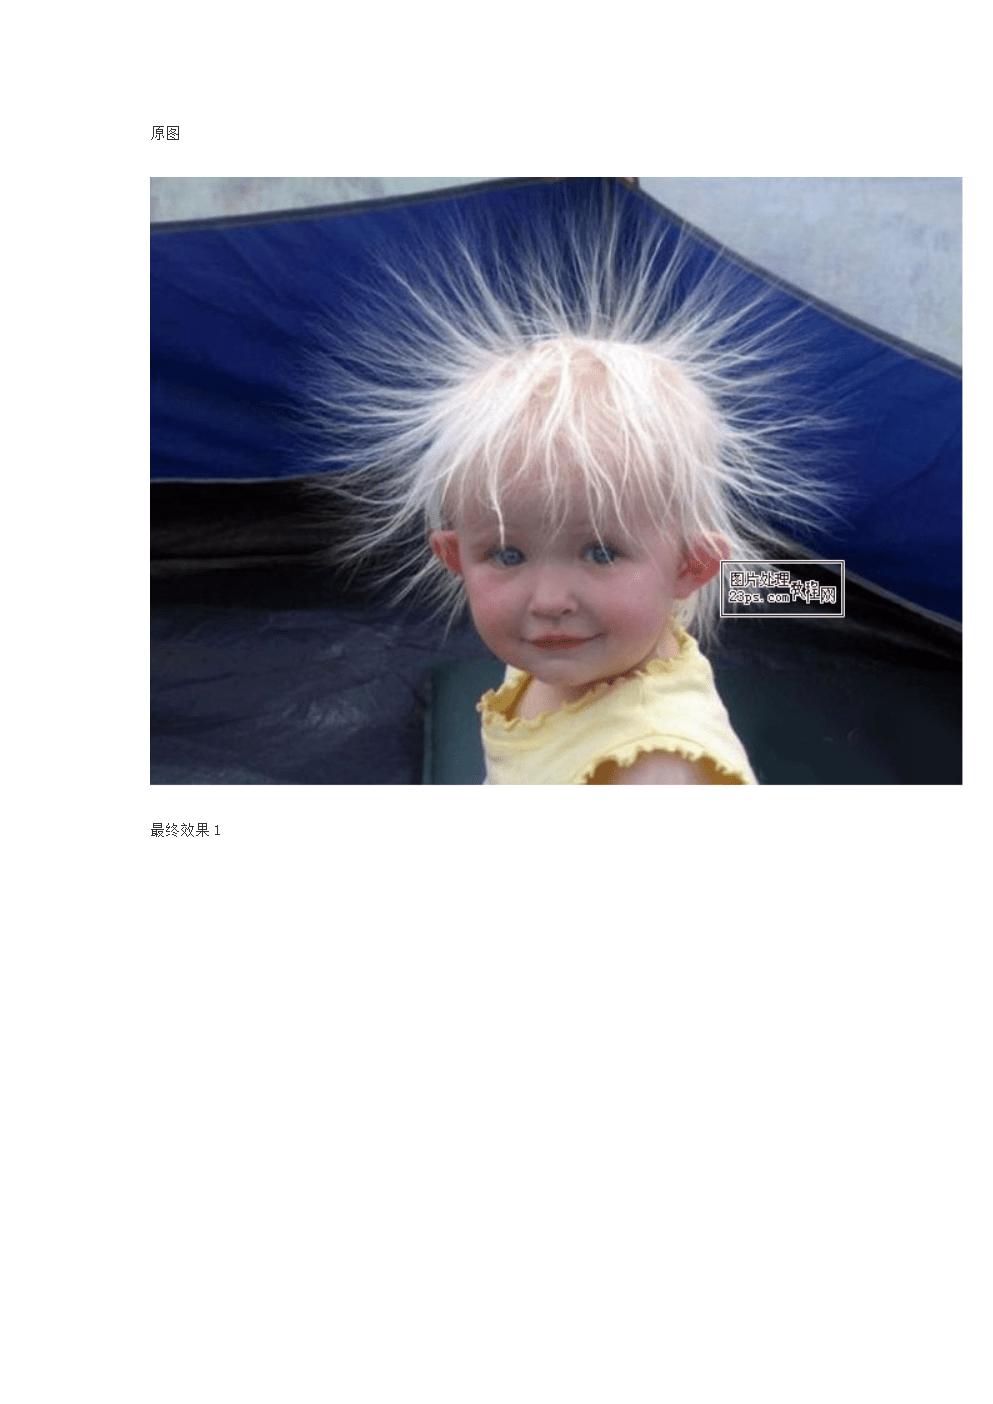 Photoshop通道抠出散乱的儿童头发.docx